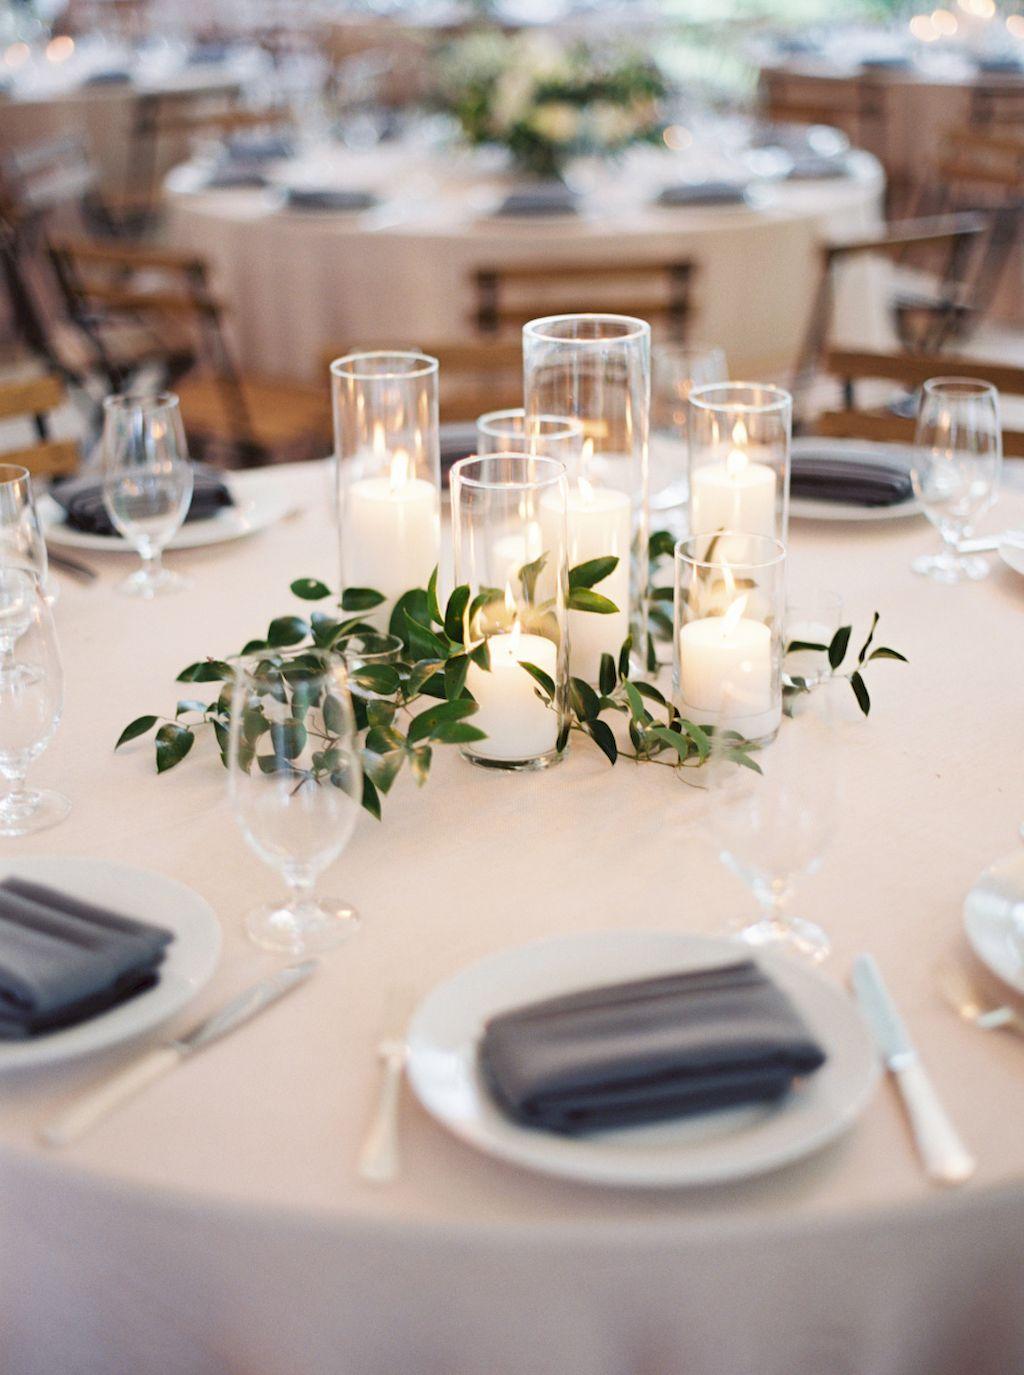 67 simple greenery wedding centerpieces ideas wedding centerpieces adorable 67 simple greenery wedding centerpieces ideas httpsbitecloth2017 cheap table centerpiecesdiy wedding flower izmirmasajfo